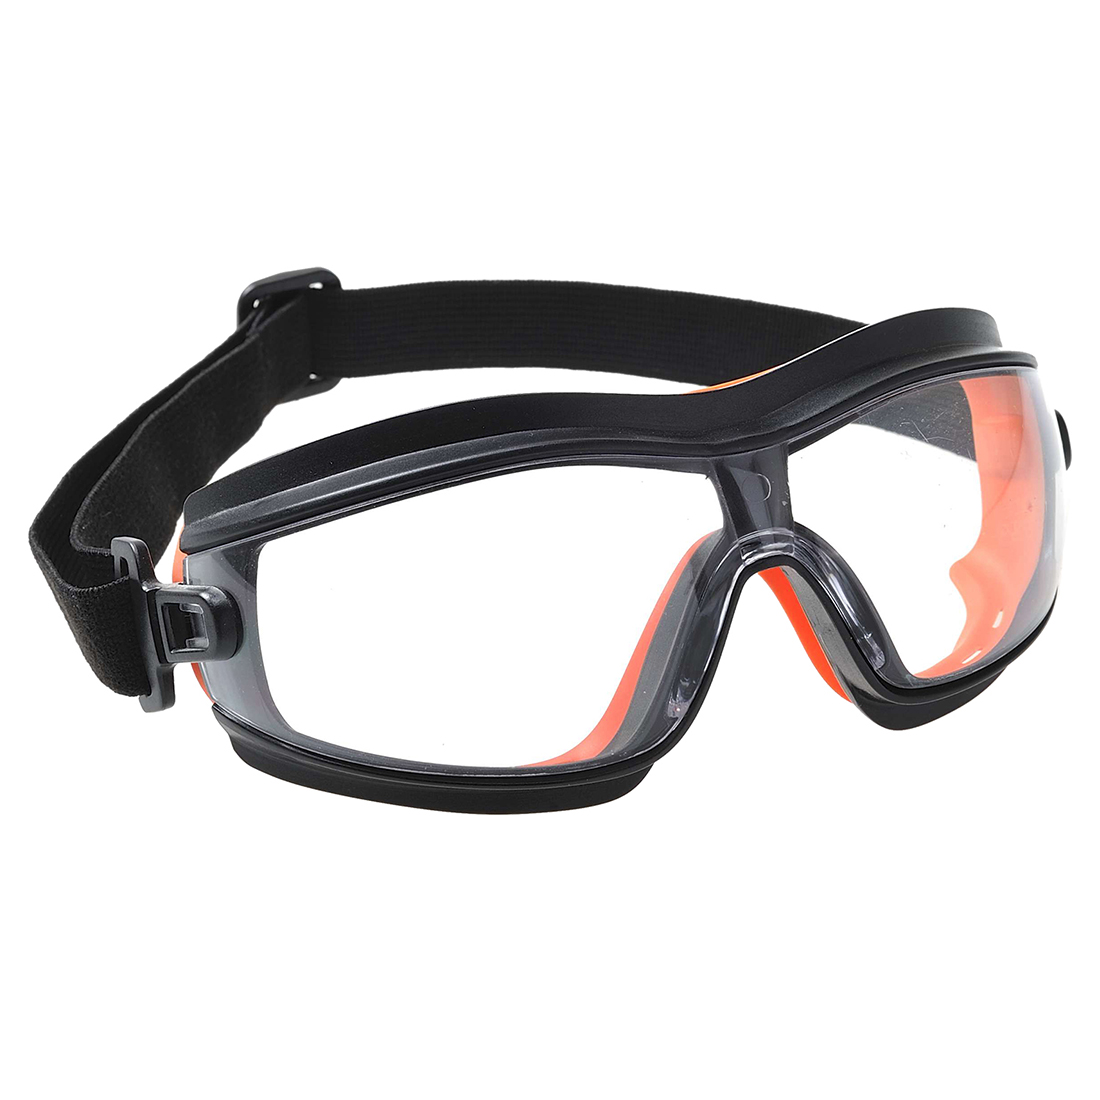 Portwest Slim Safety Goggle - PW26